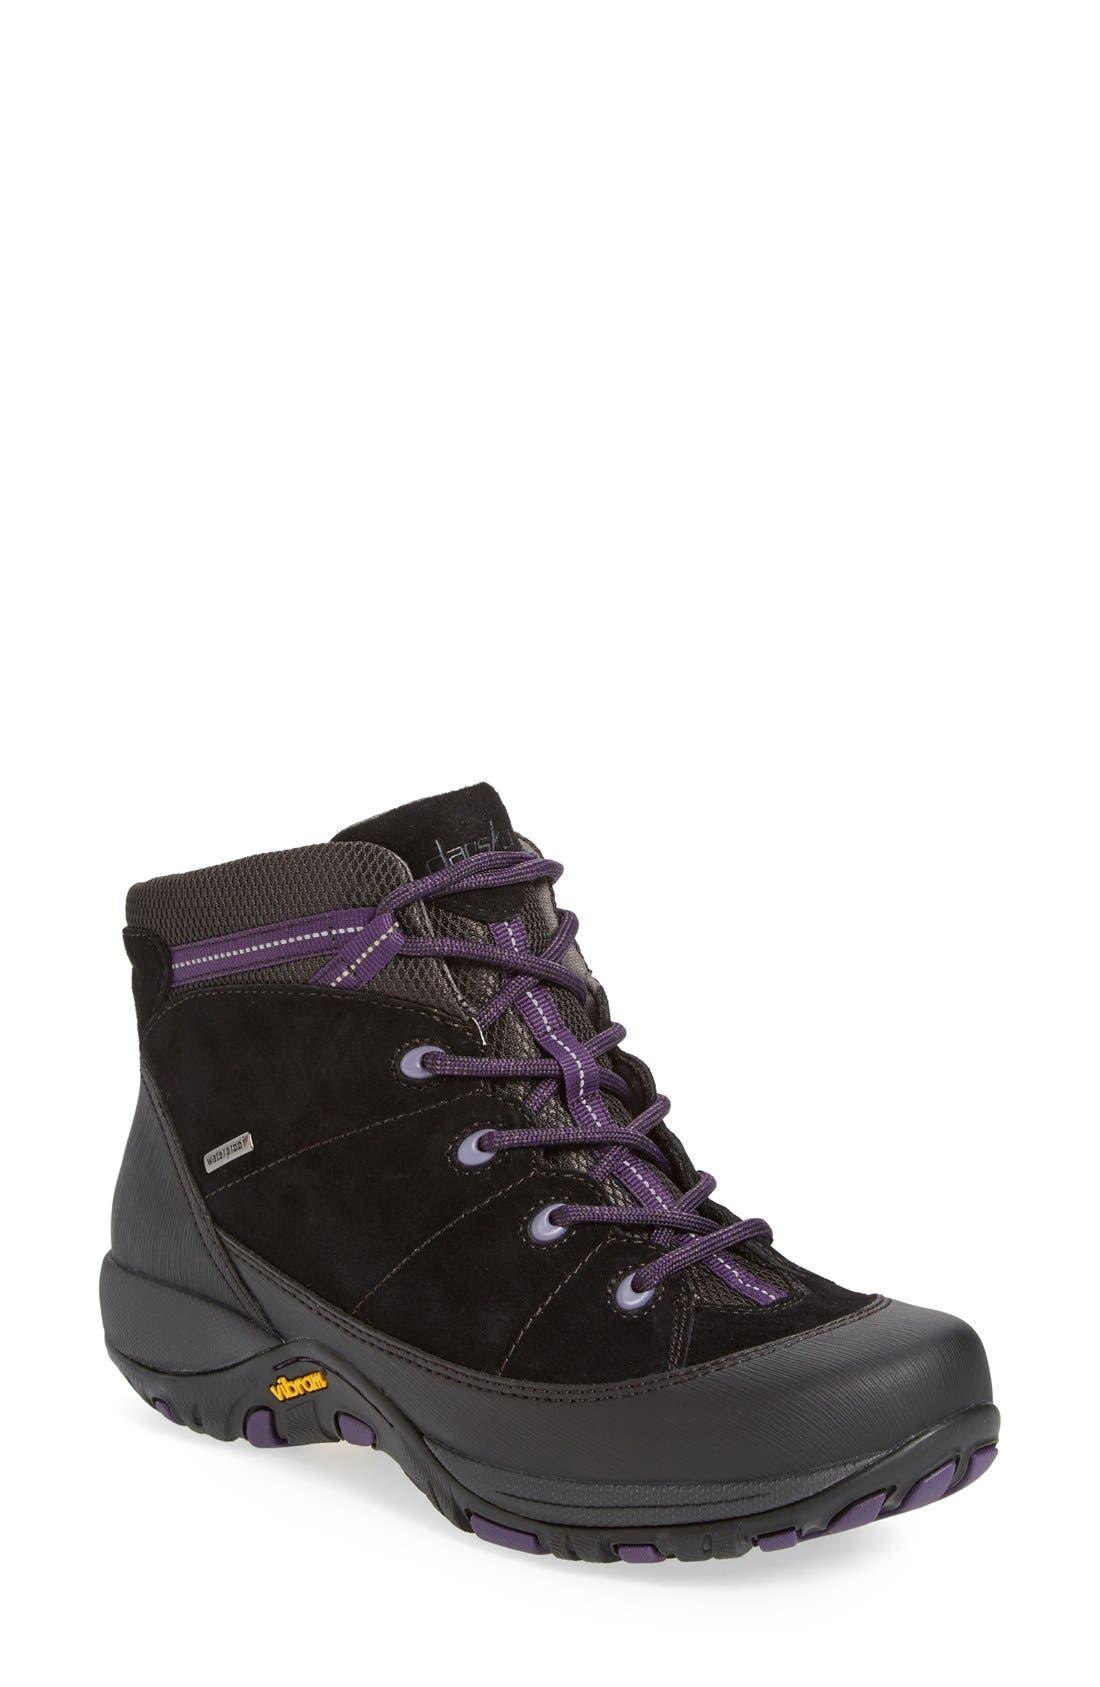 'Paulette' Waterproof Hiking Boot,                             Main thumbnail 1, color,                             001